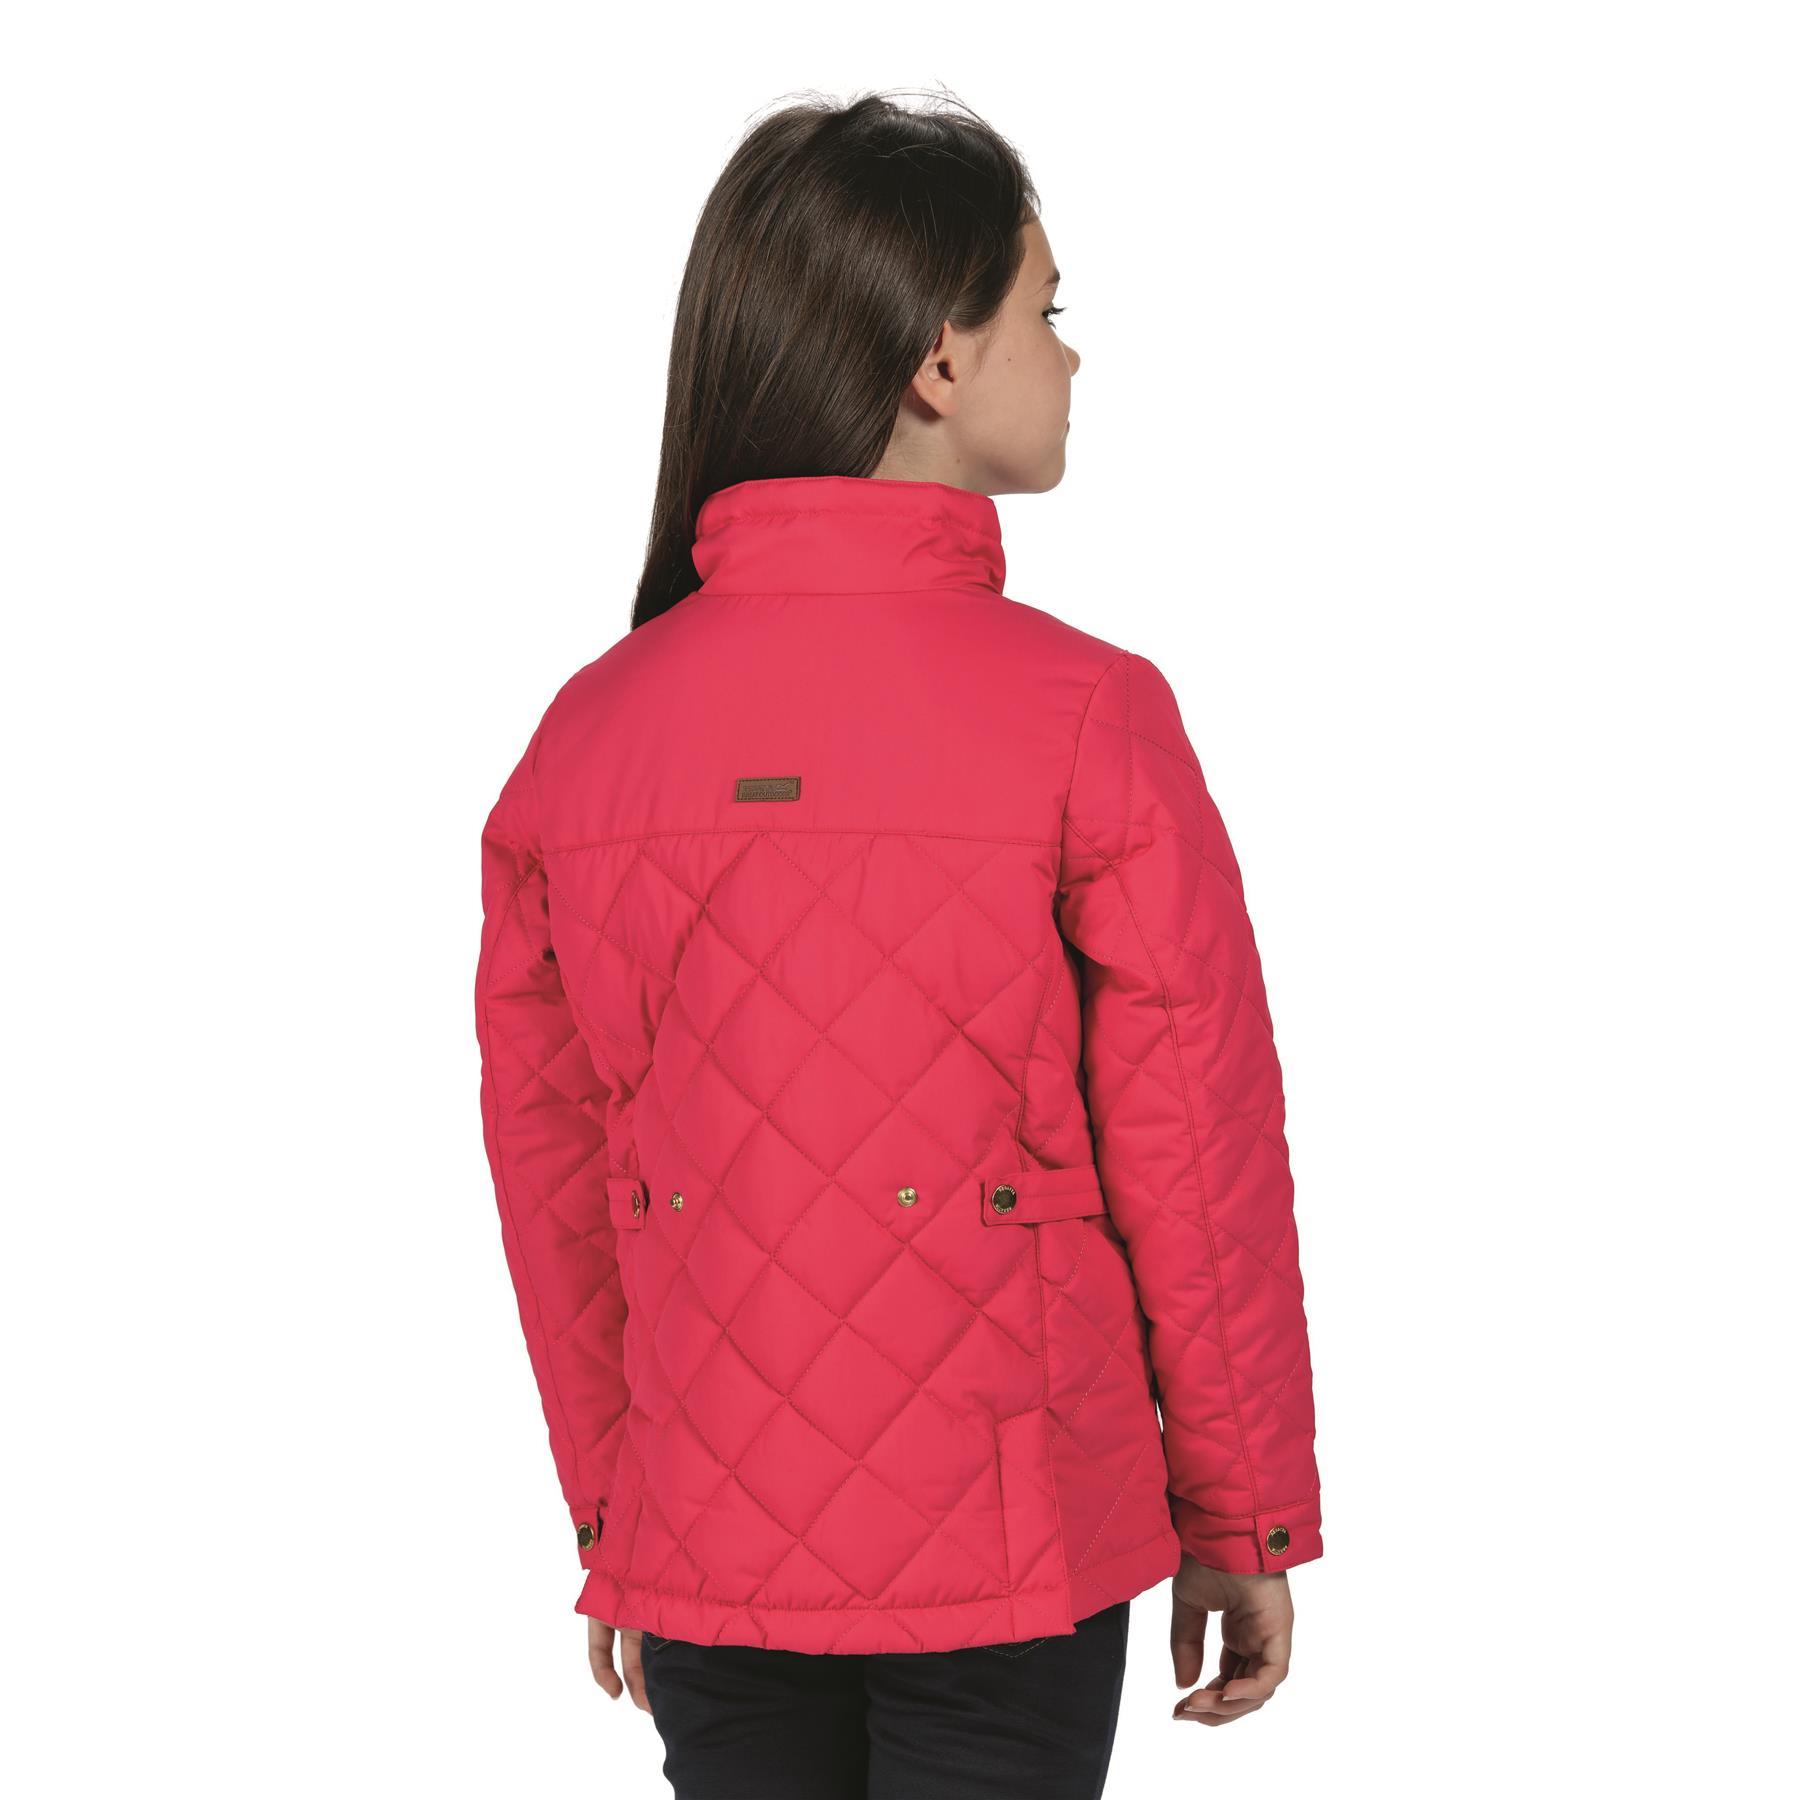 miniatuur 4 - Regatta Kids Zalenka Quilted Insulated Zipped Pocket Jacket Boys Girls